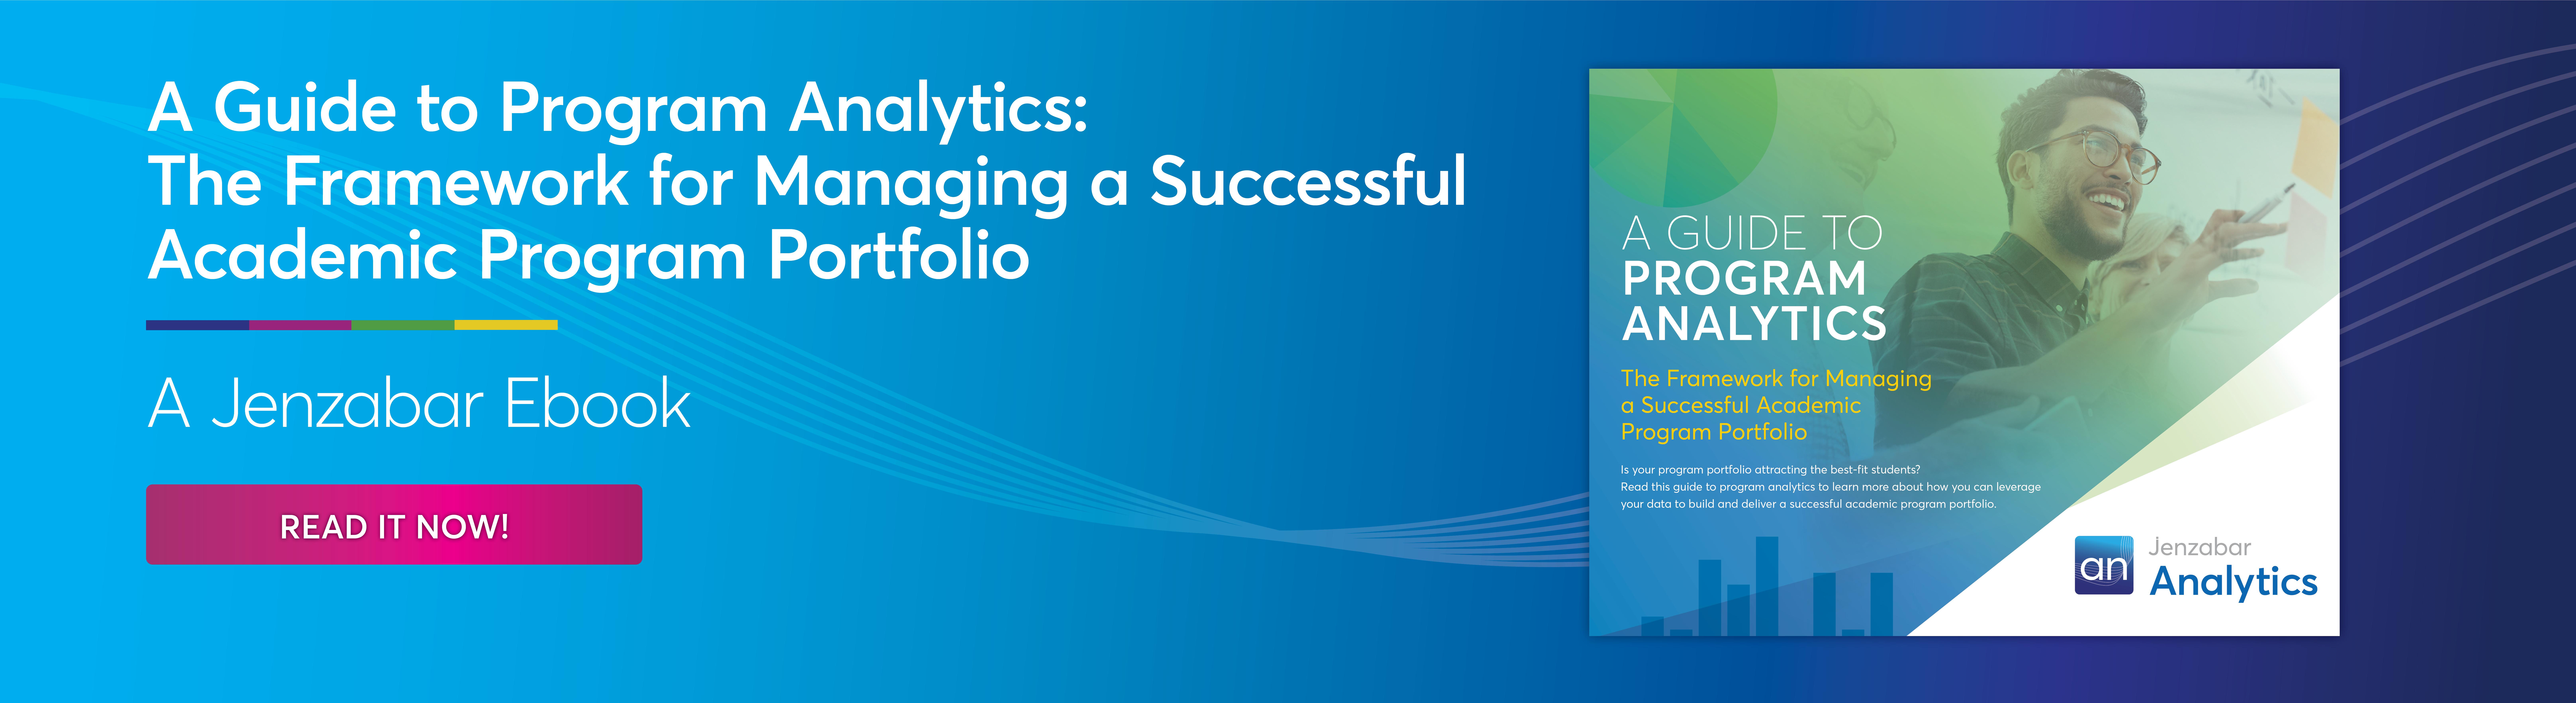 Jenzabar Ebook: A Guide to Program Analytics